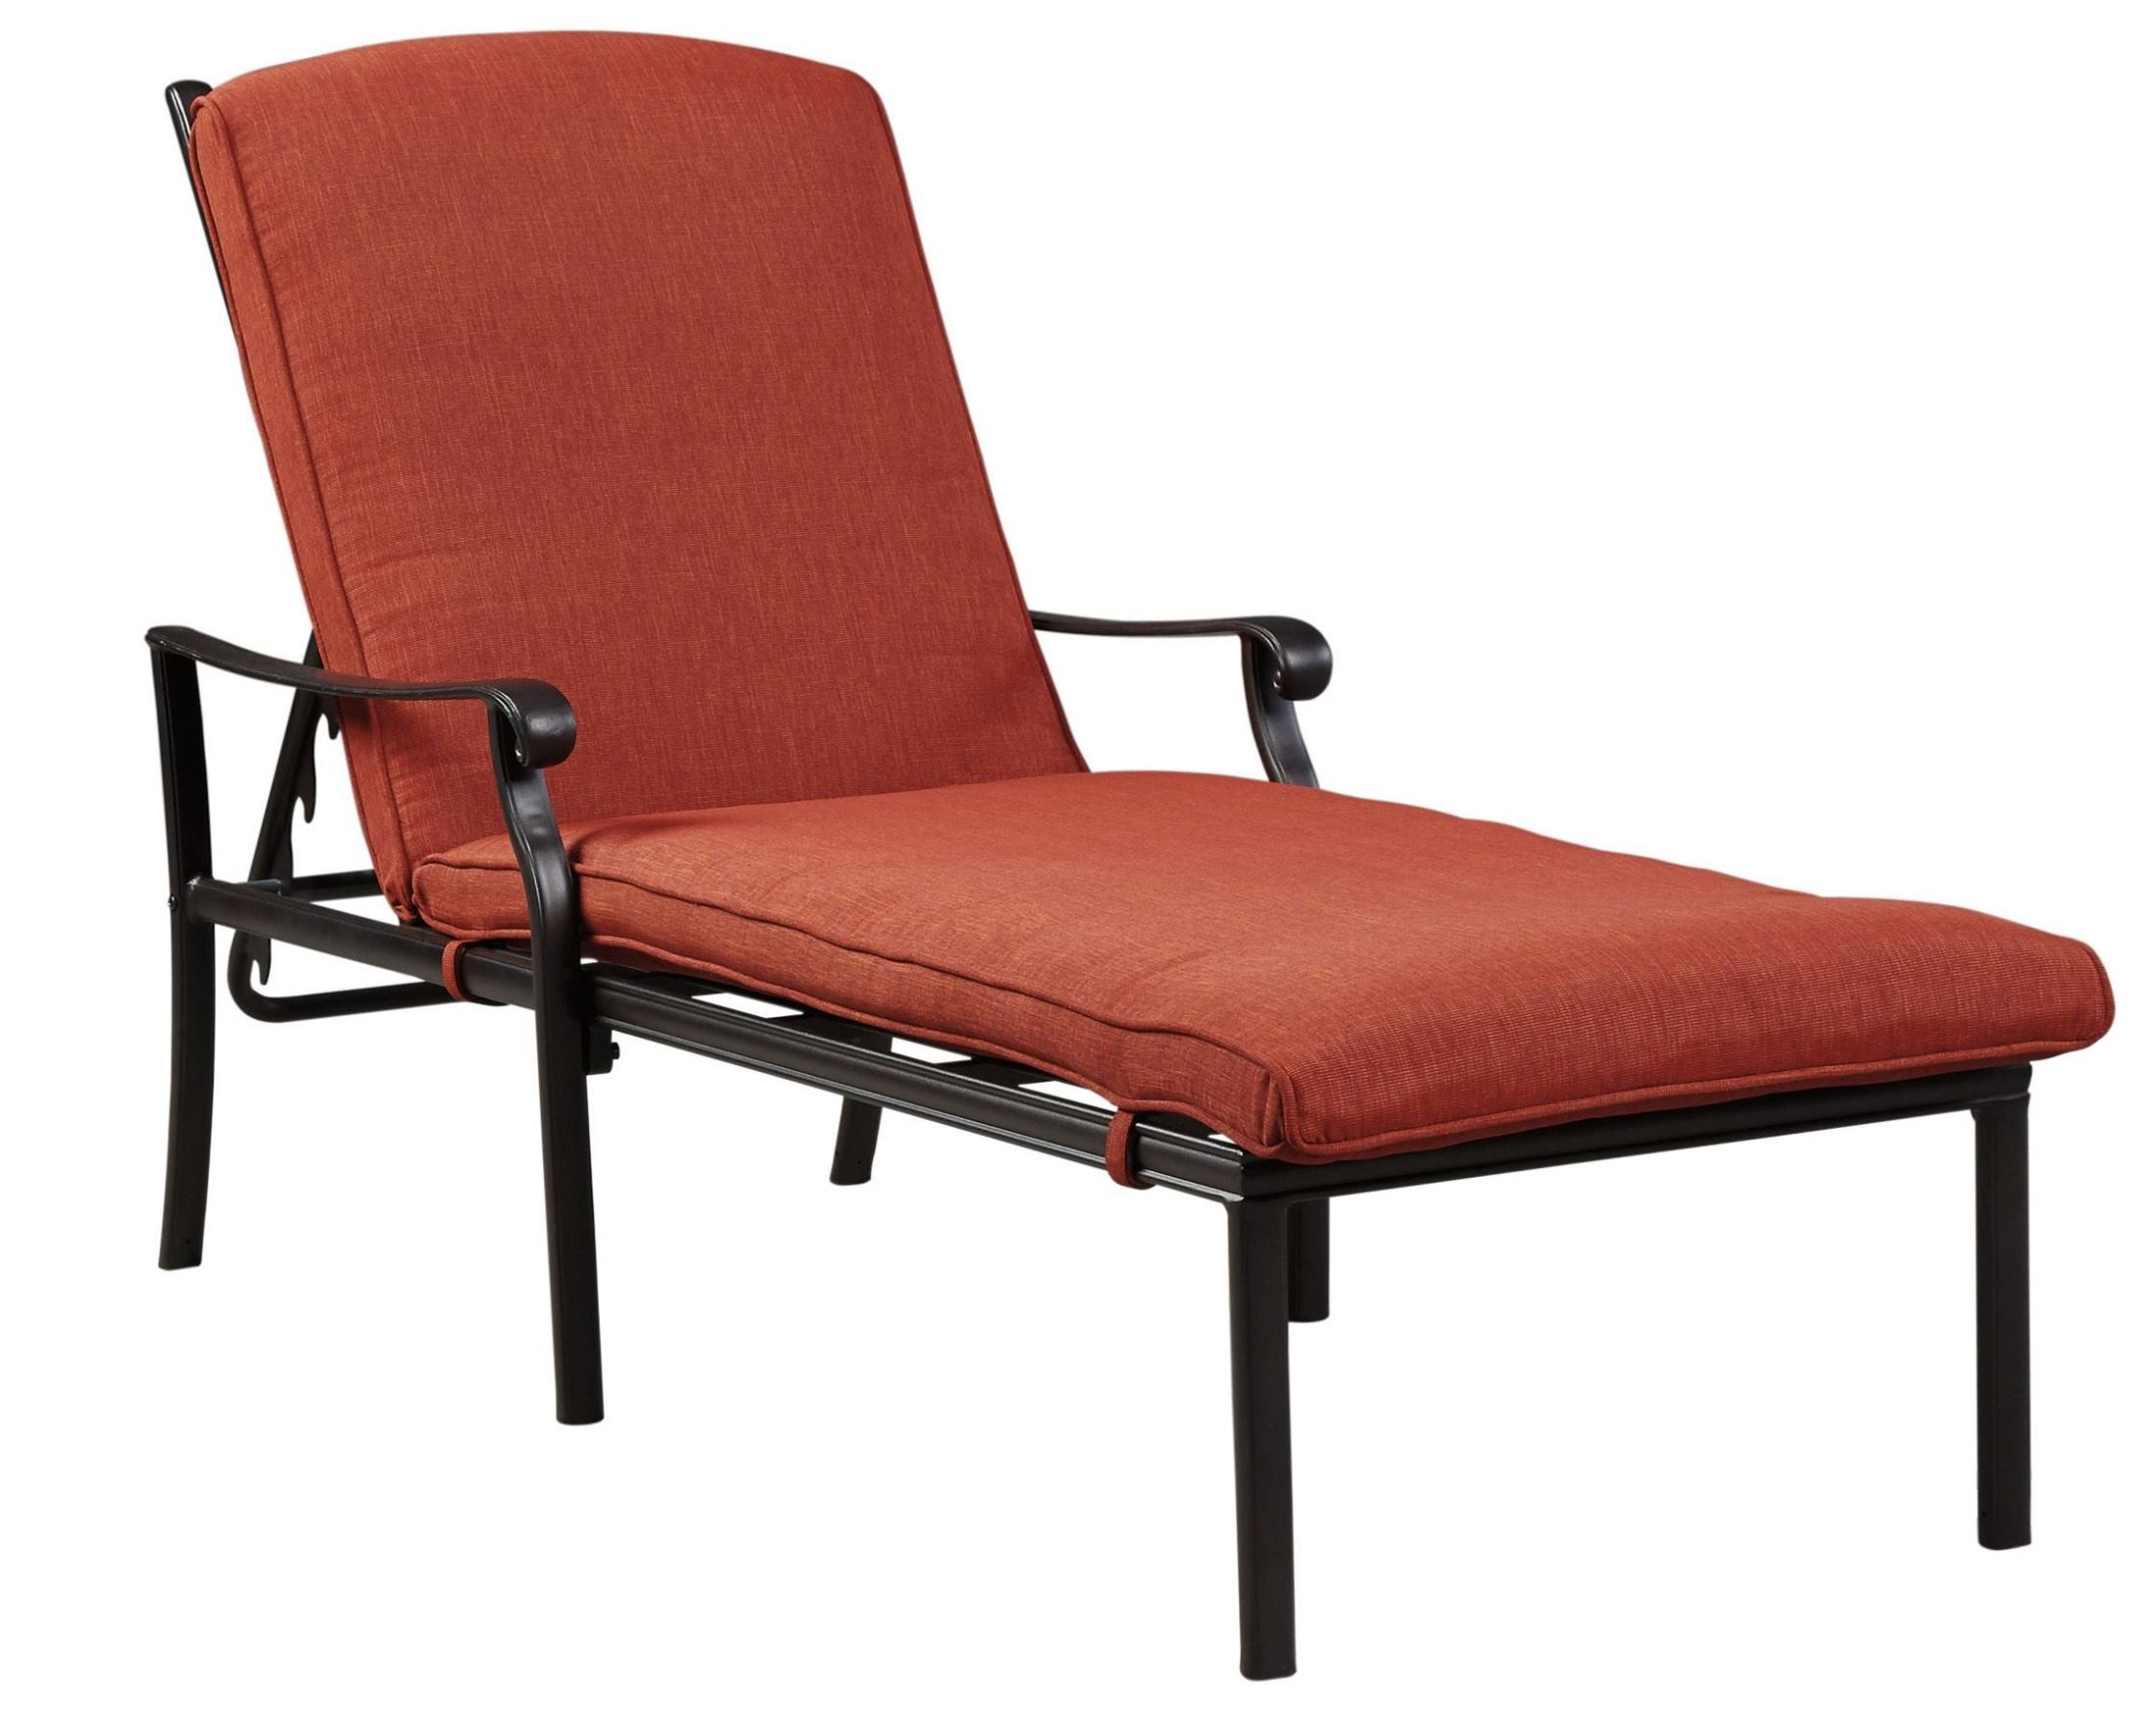 Tanglevale Burnt Orange Chaise Lounge, P557-815, Ashley